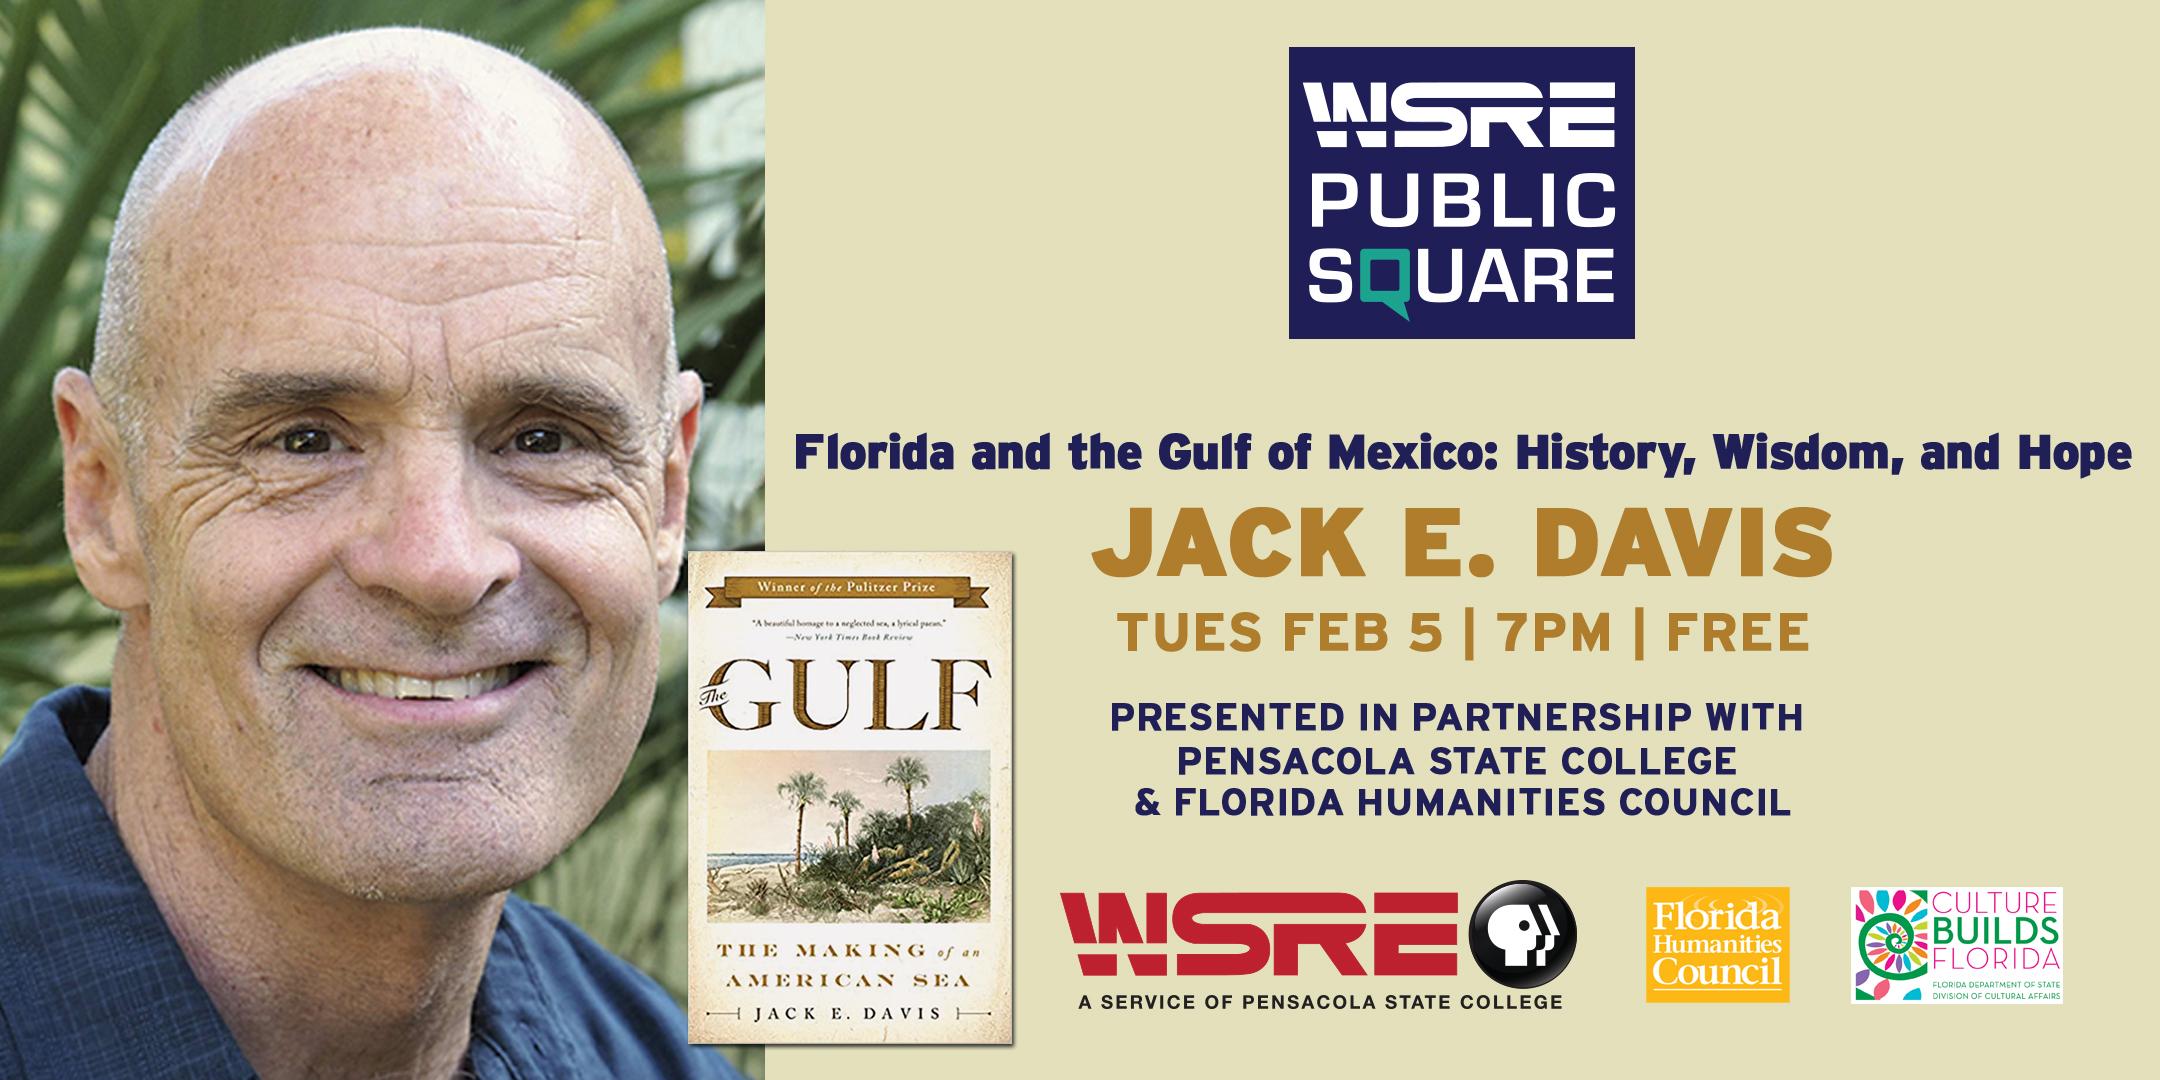 Jack E. Davis: Florida and the Gulf of Mexico: History, Wisdom, and Hope